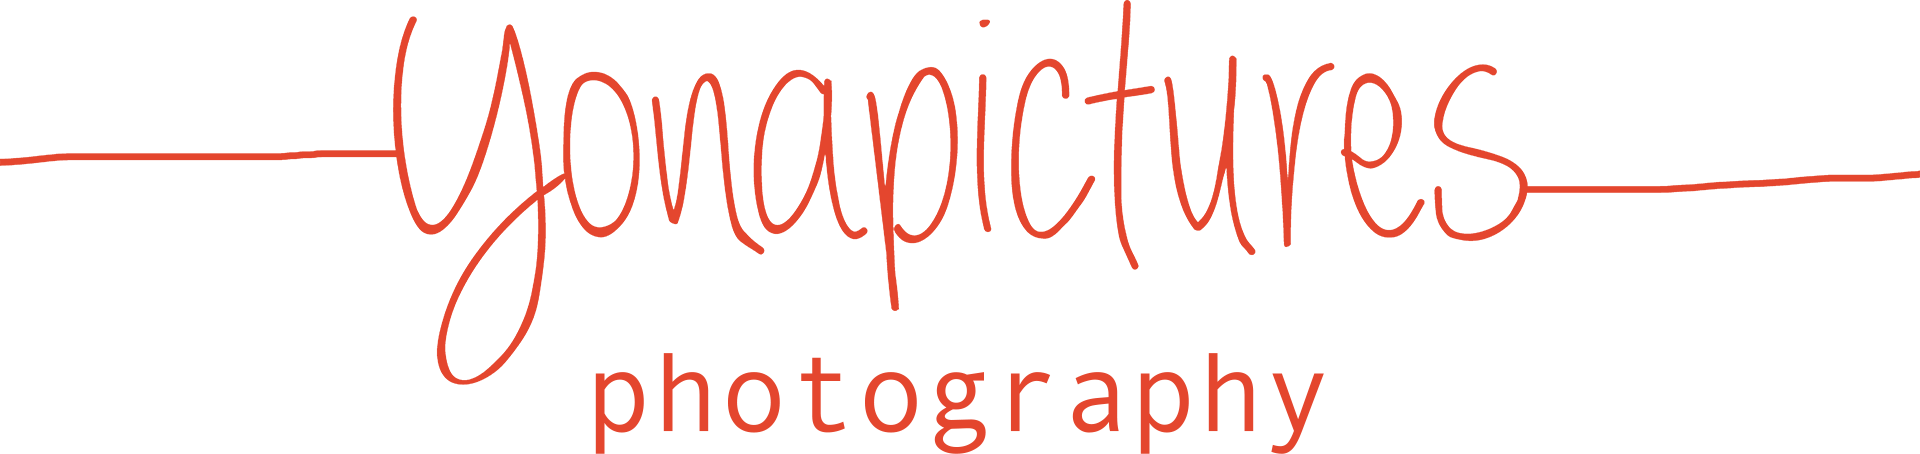 Yonapictures logo oranje